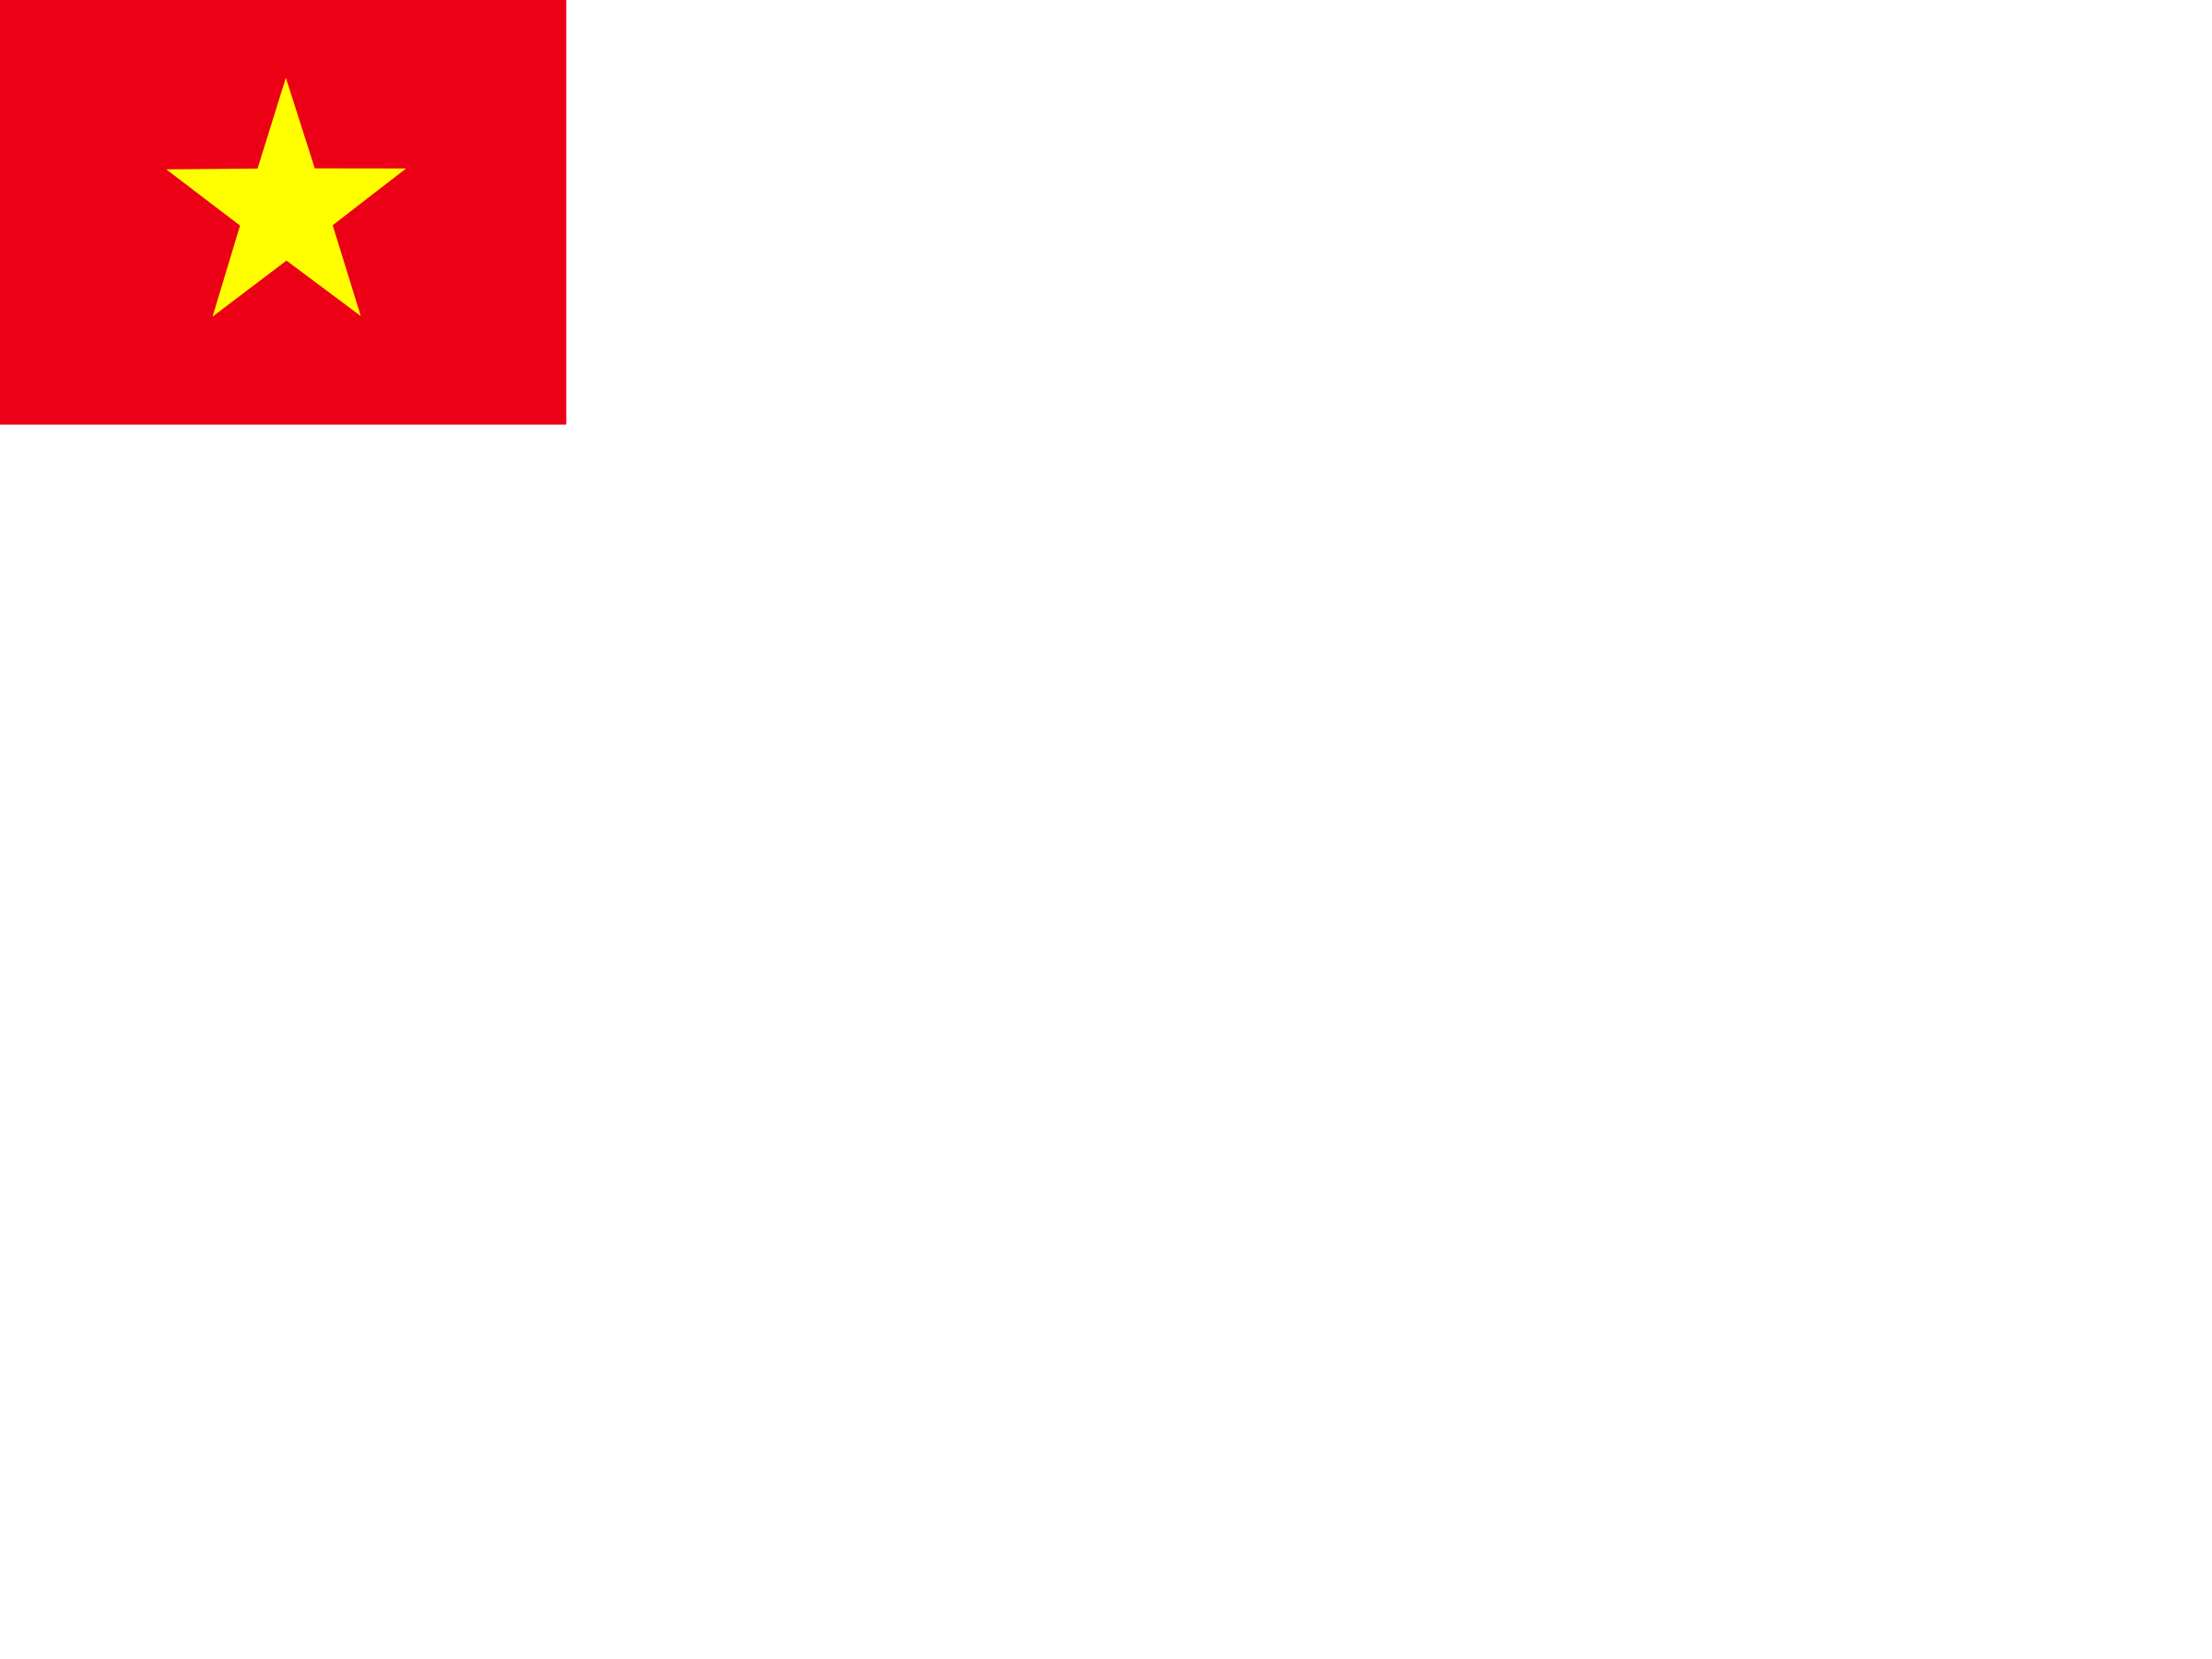 Flag Of Vietnam Logo Png Transparent Svg Vector Freebie Supply